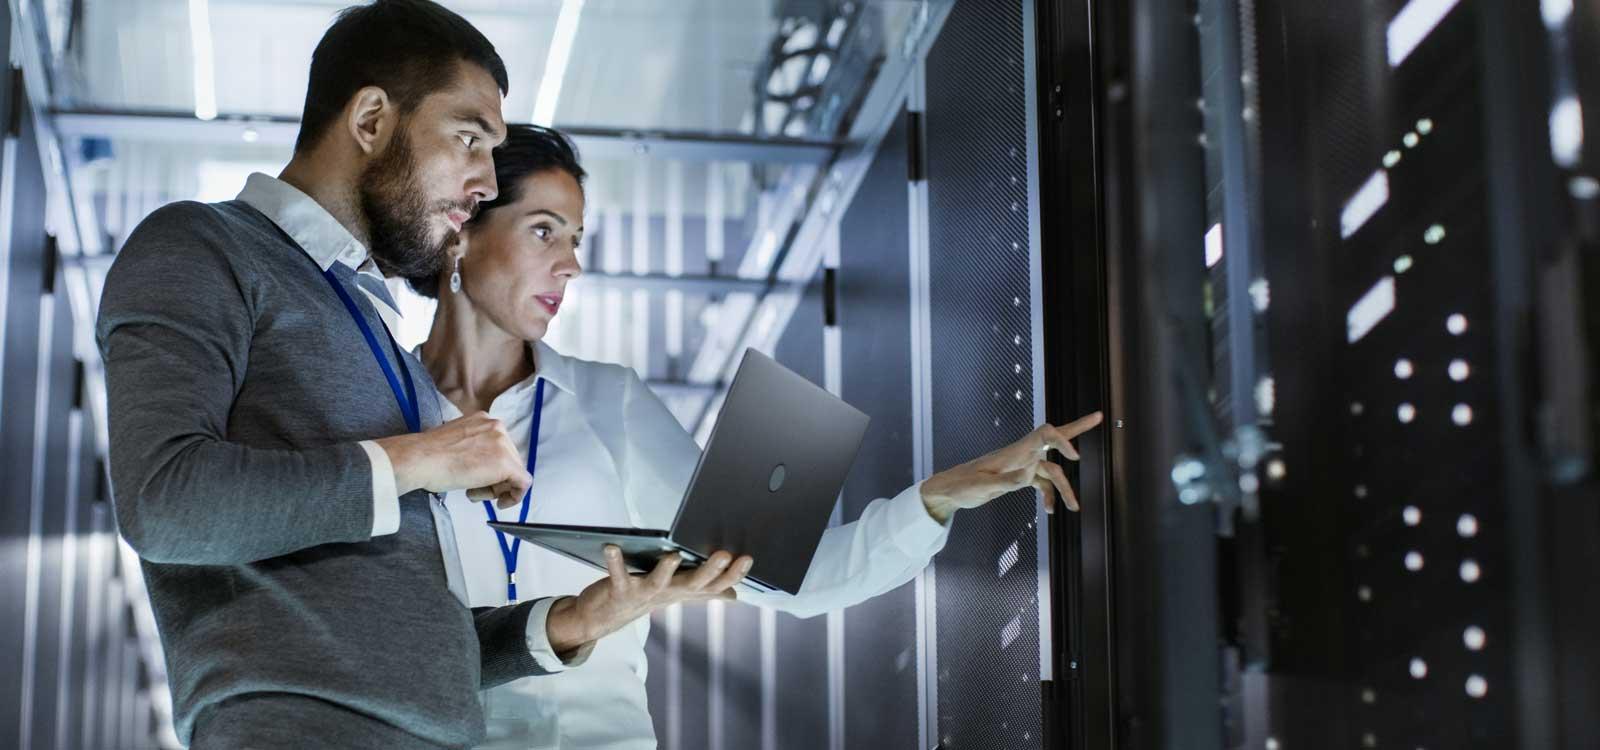 Server Support Blog | Cii Technology Solutions